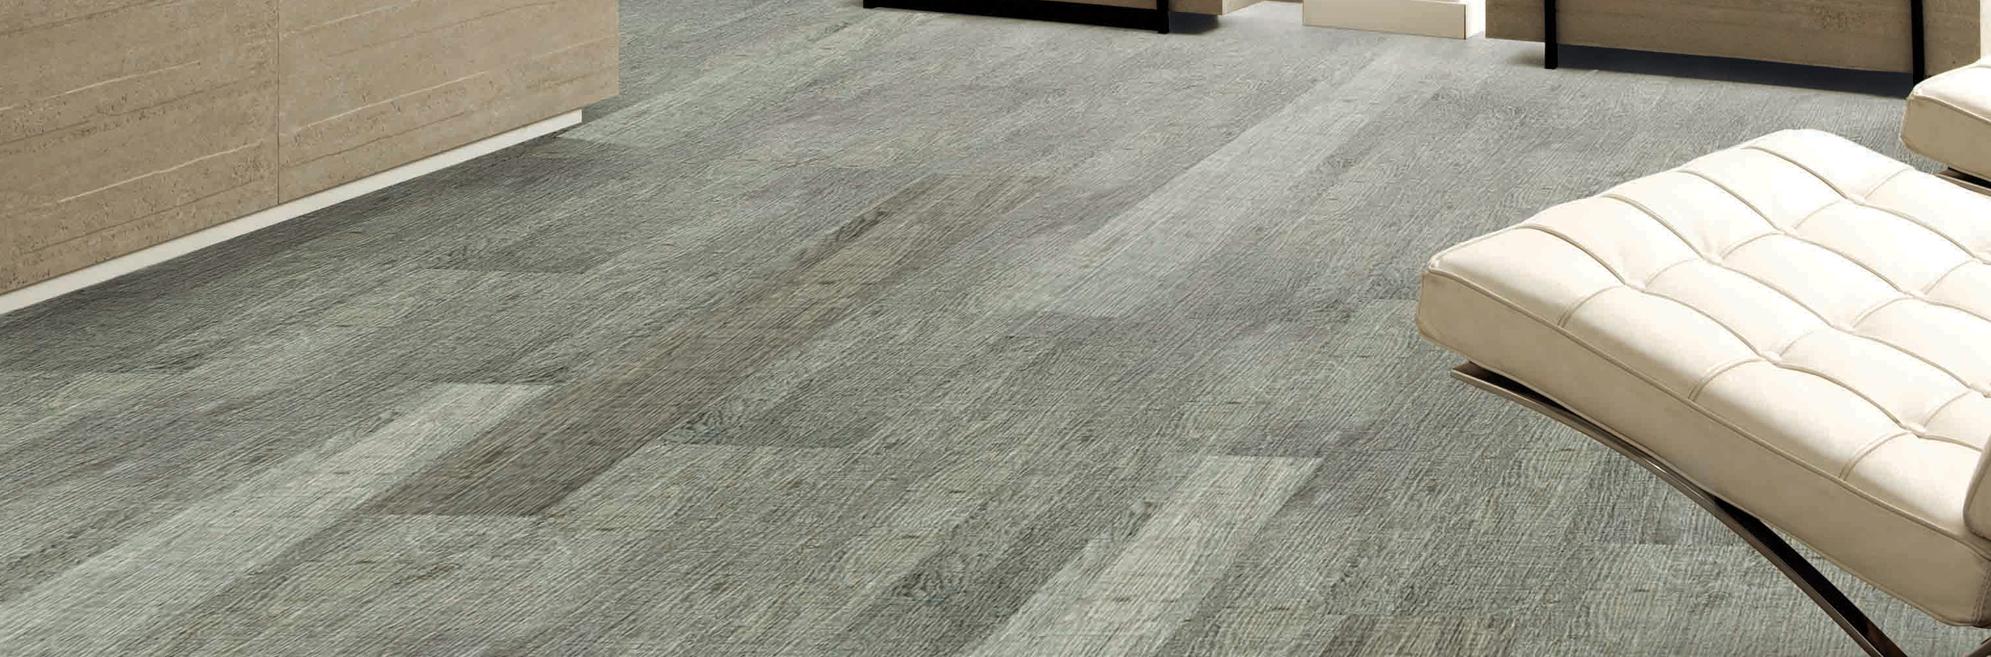 Commercial Flooring Sydney Nsw Flooring Specialists